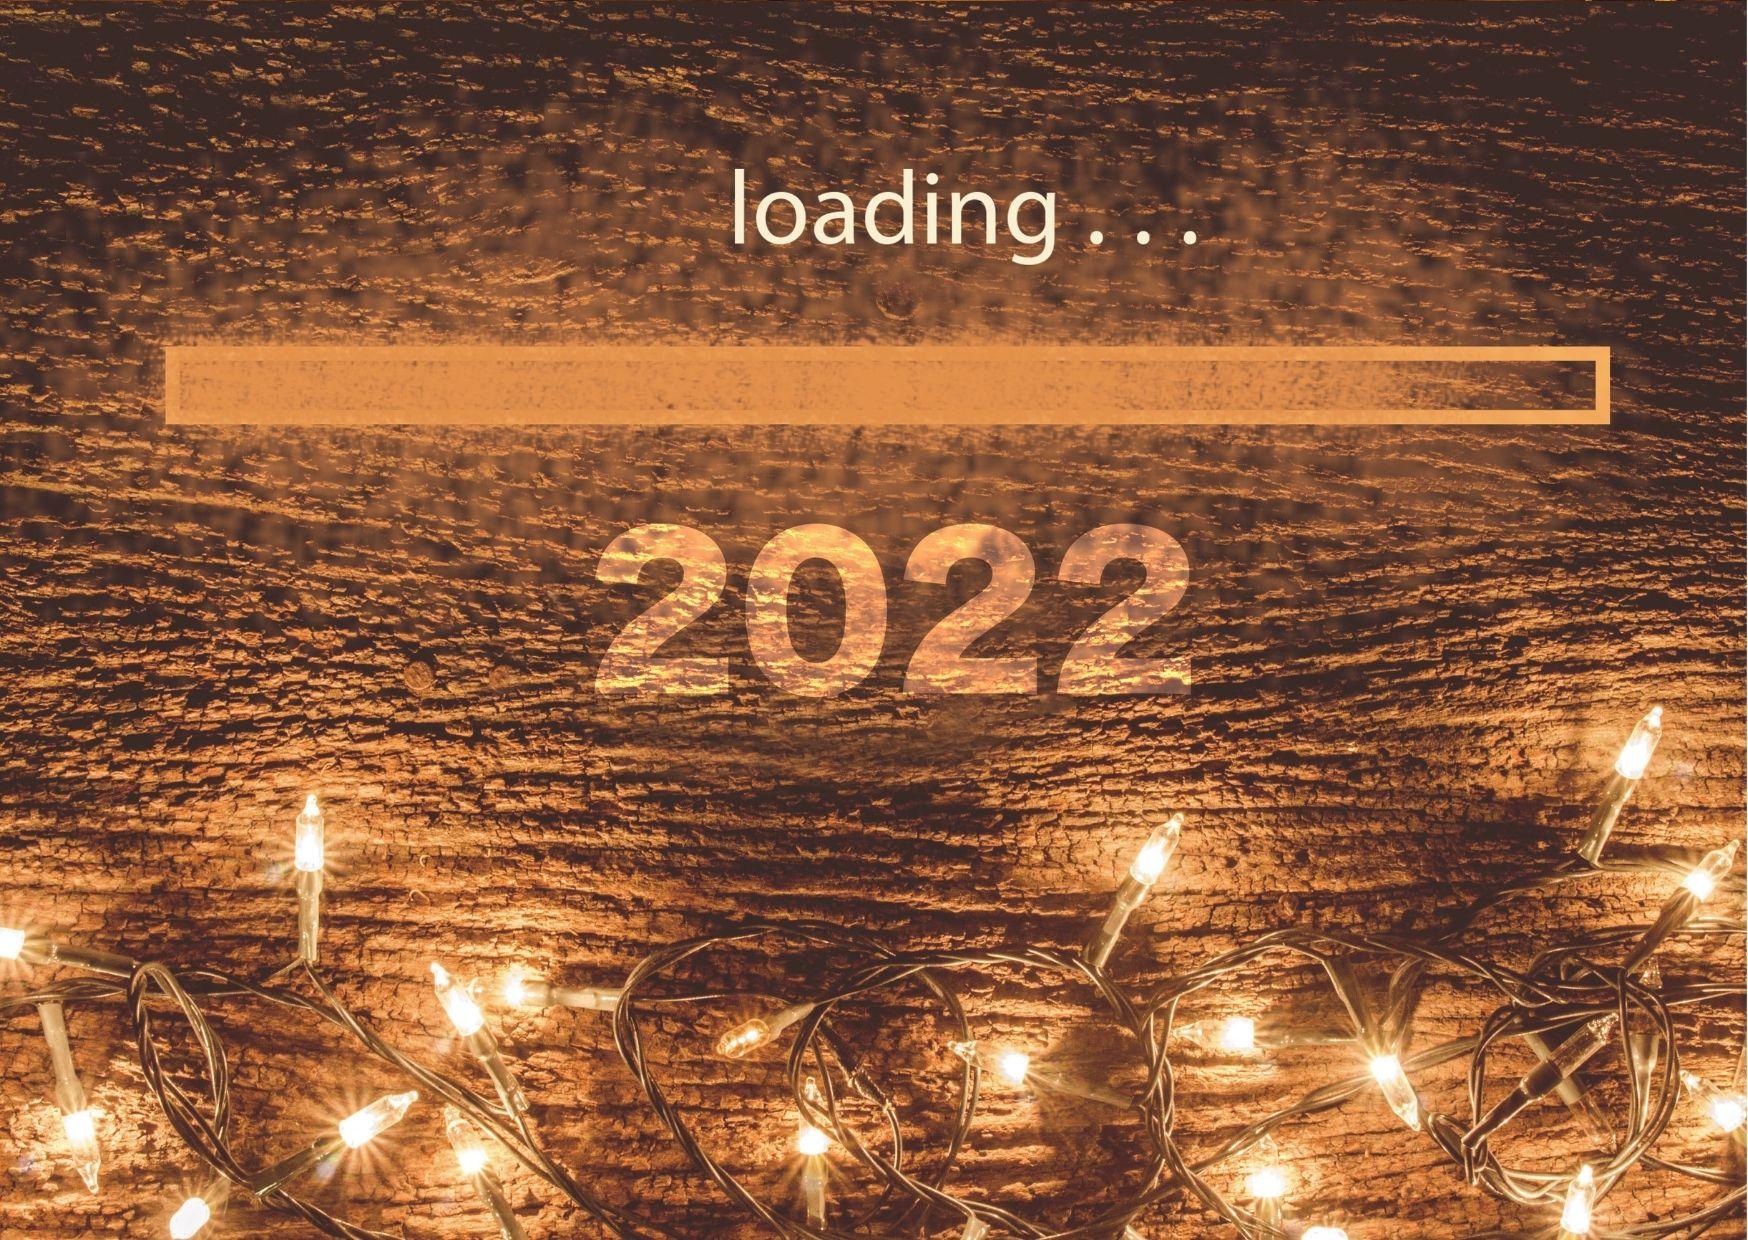 loading 2022